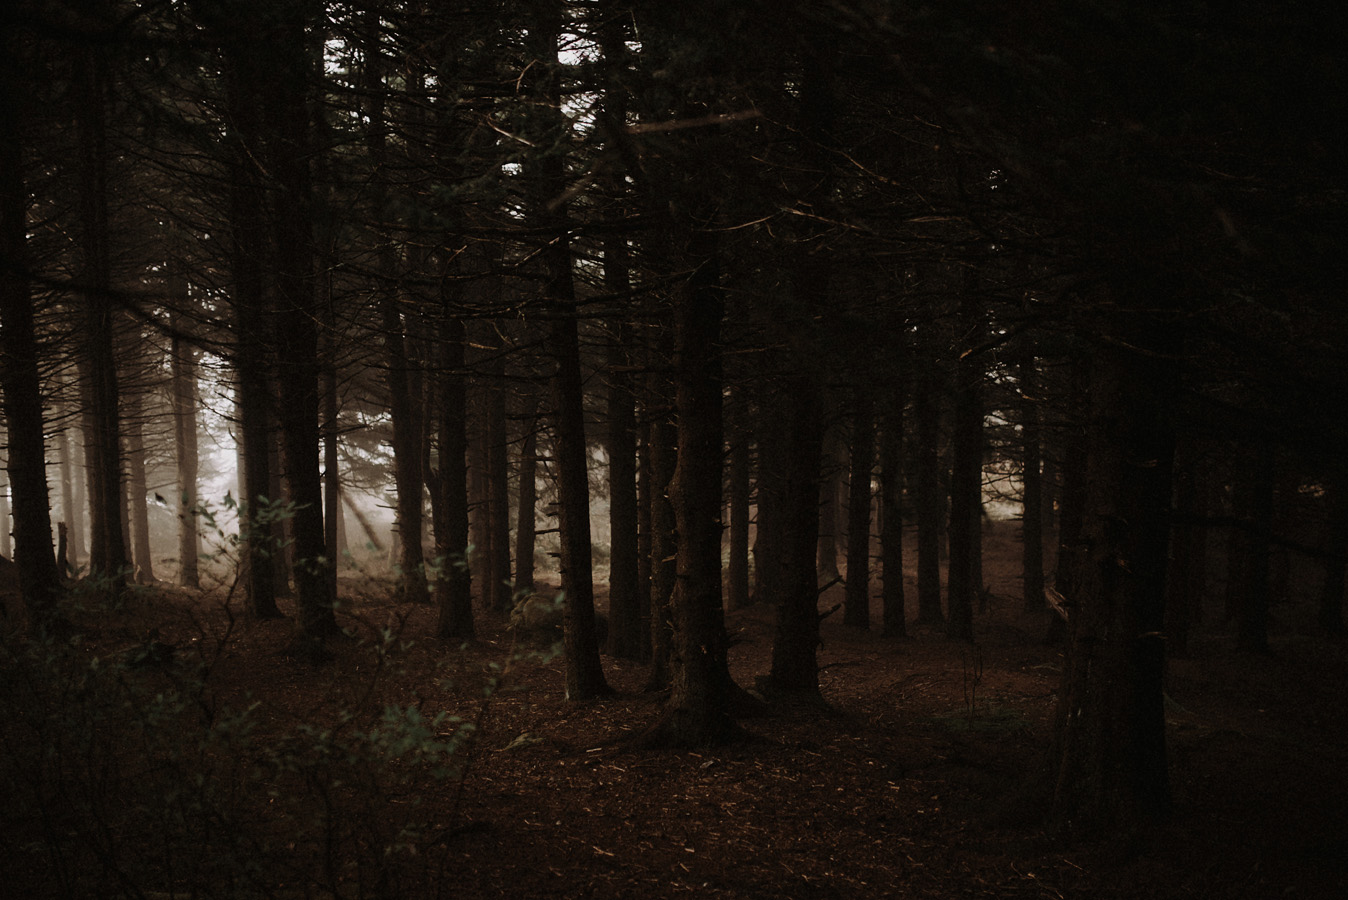 Sunrise+Engagement+Adventure+Hiking+Session+in+the+Blue+Ridge+Smoky+Mountains (1).jpeg